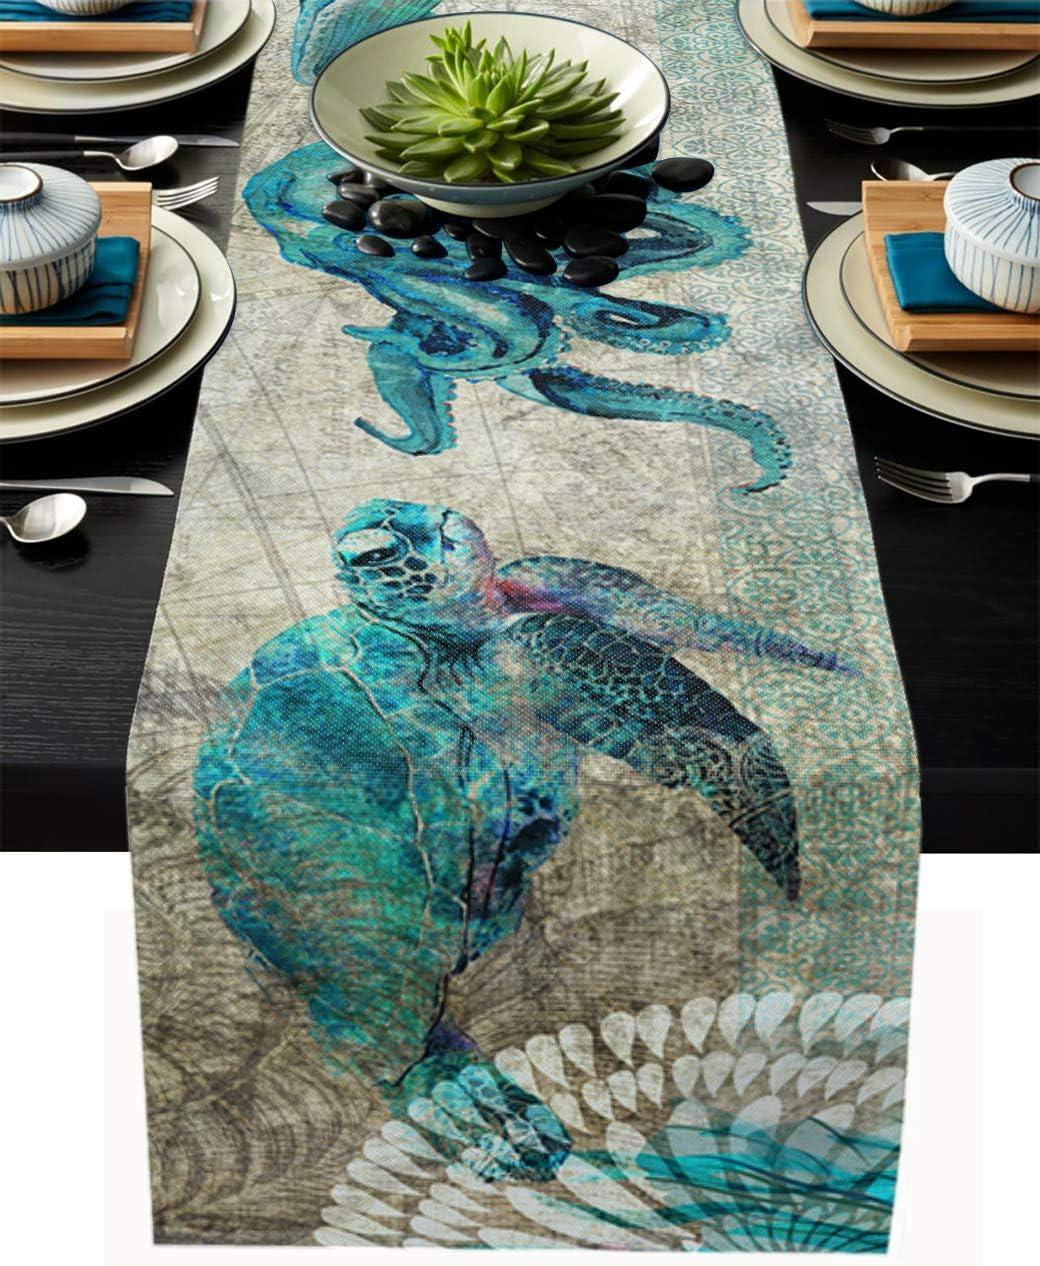 Sea Table Runner-Cotton linen-Long 72 inche Dresser Beach Scarve Direct stock Sacramento Mall discount